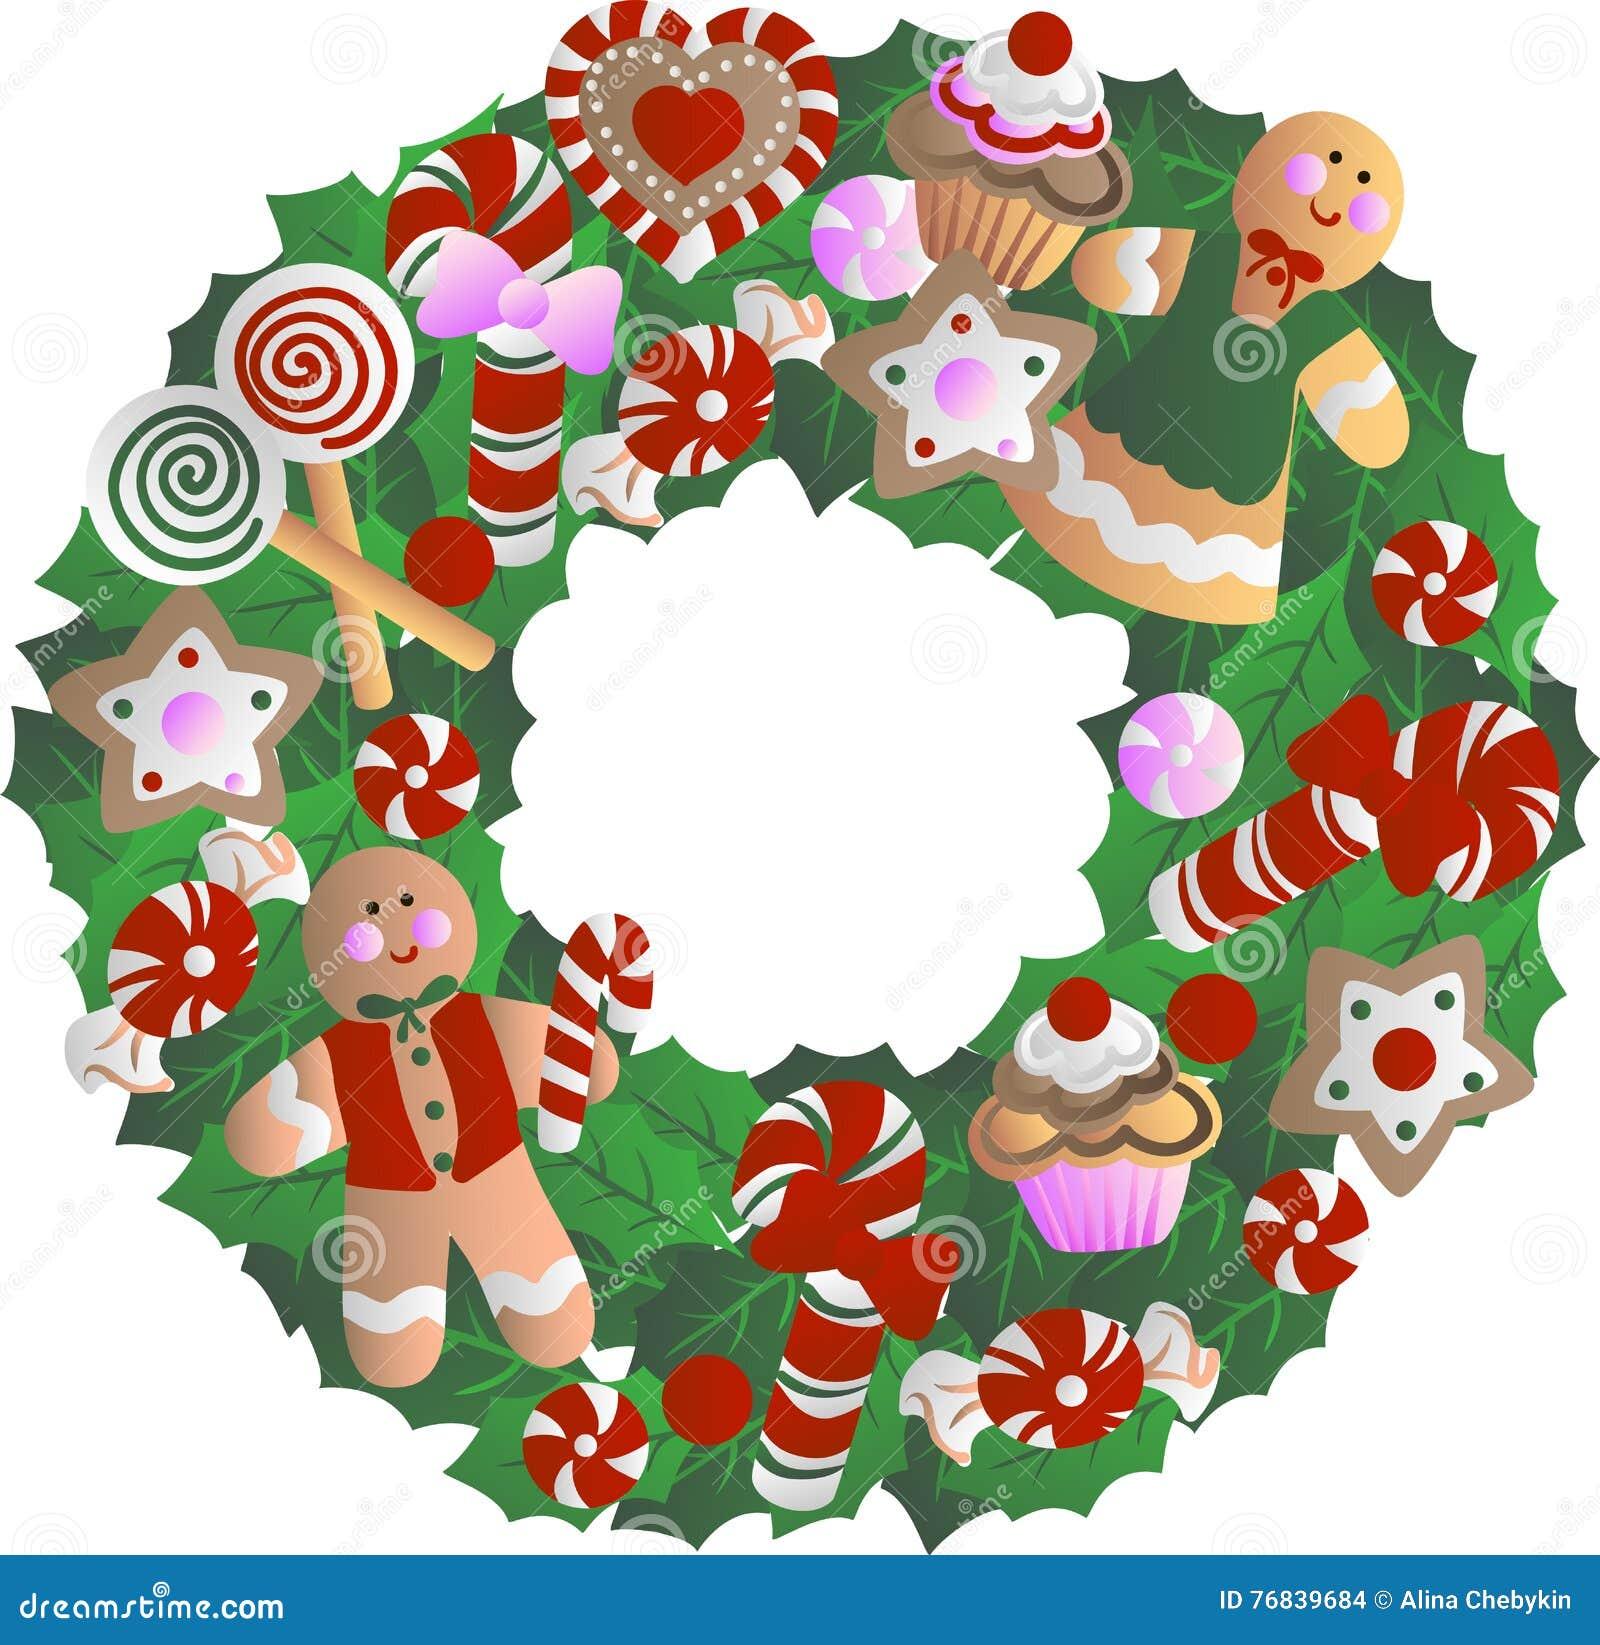 Holly Christmas Wreath Stock Vector Illustration Of Leaf 76839684